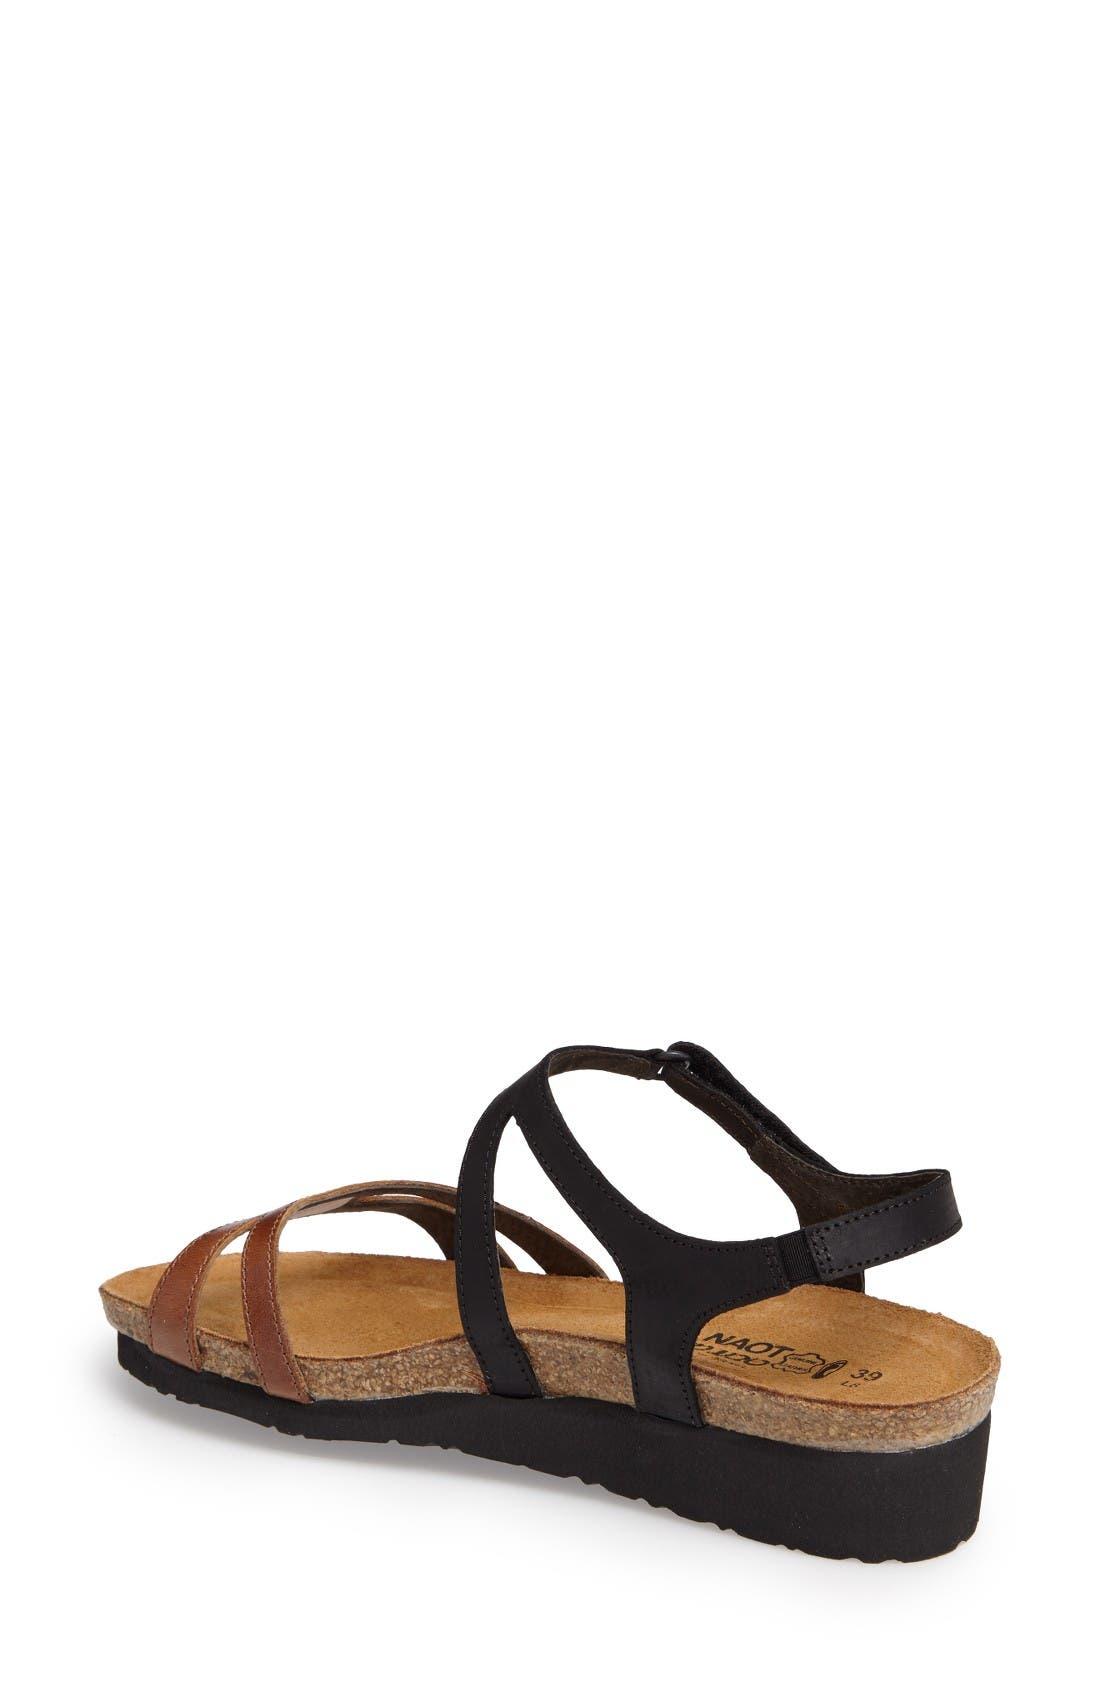 Janis Sandal,                             Alternate thumbnail 2, color,                             Brown/ Black Leather